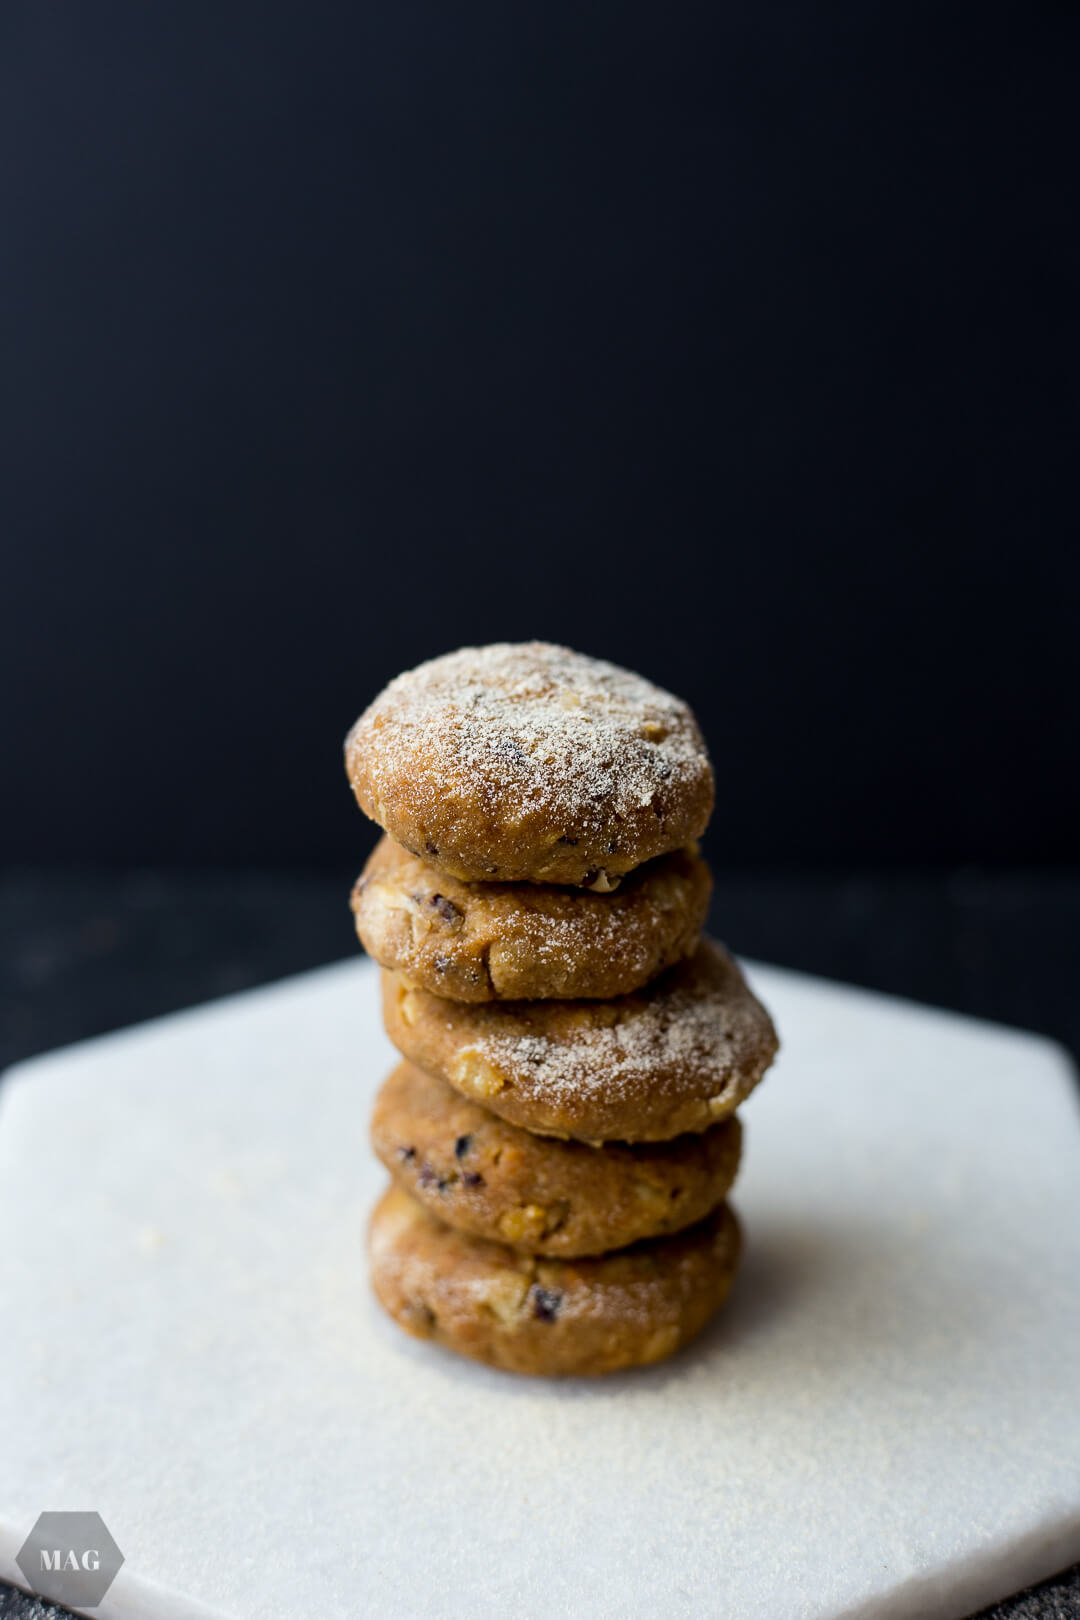 Kichererbsenkekse, Kichererbsen-Cookies, Kichererbsen Kekse vegan, Kichererbsen Kekse, Kichererbsen Kekse rohvegan, Kichererbsen Kekse selbstgemacht, Kekse aus Kichererbsen